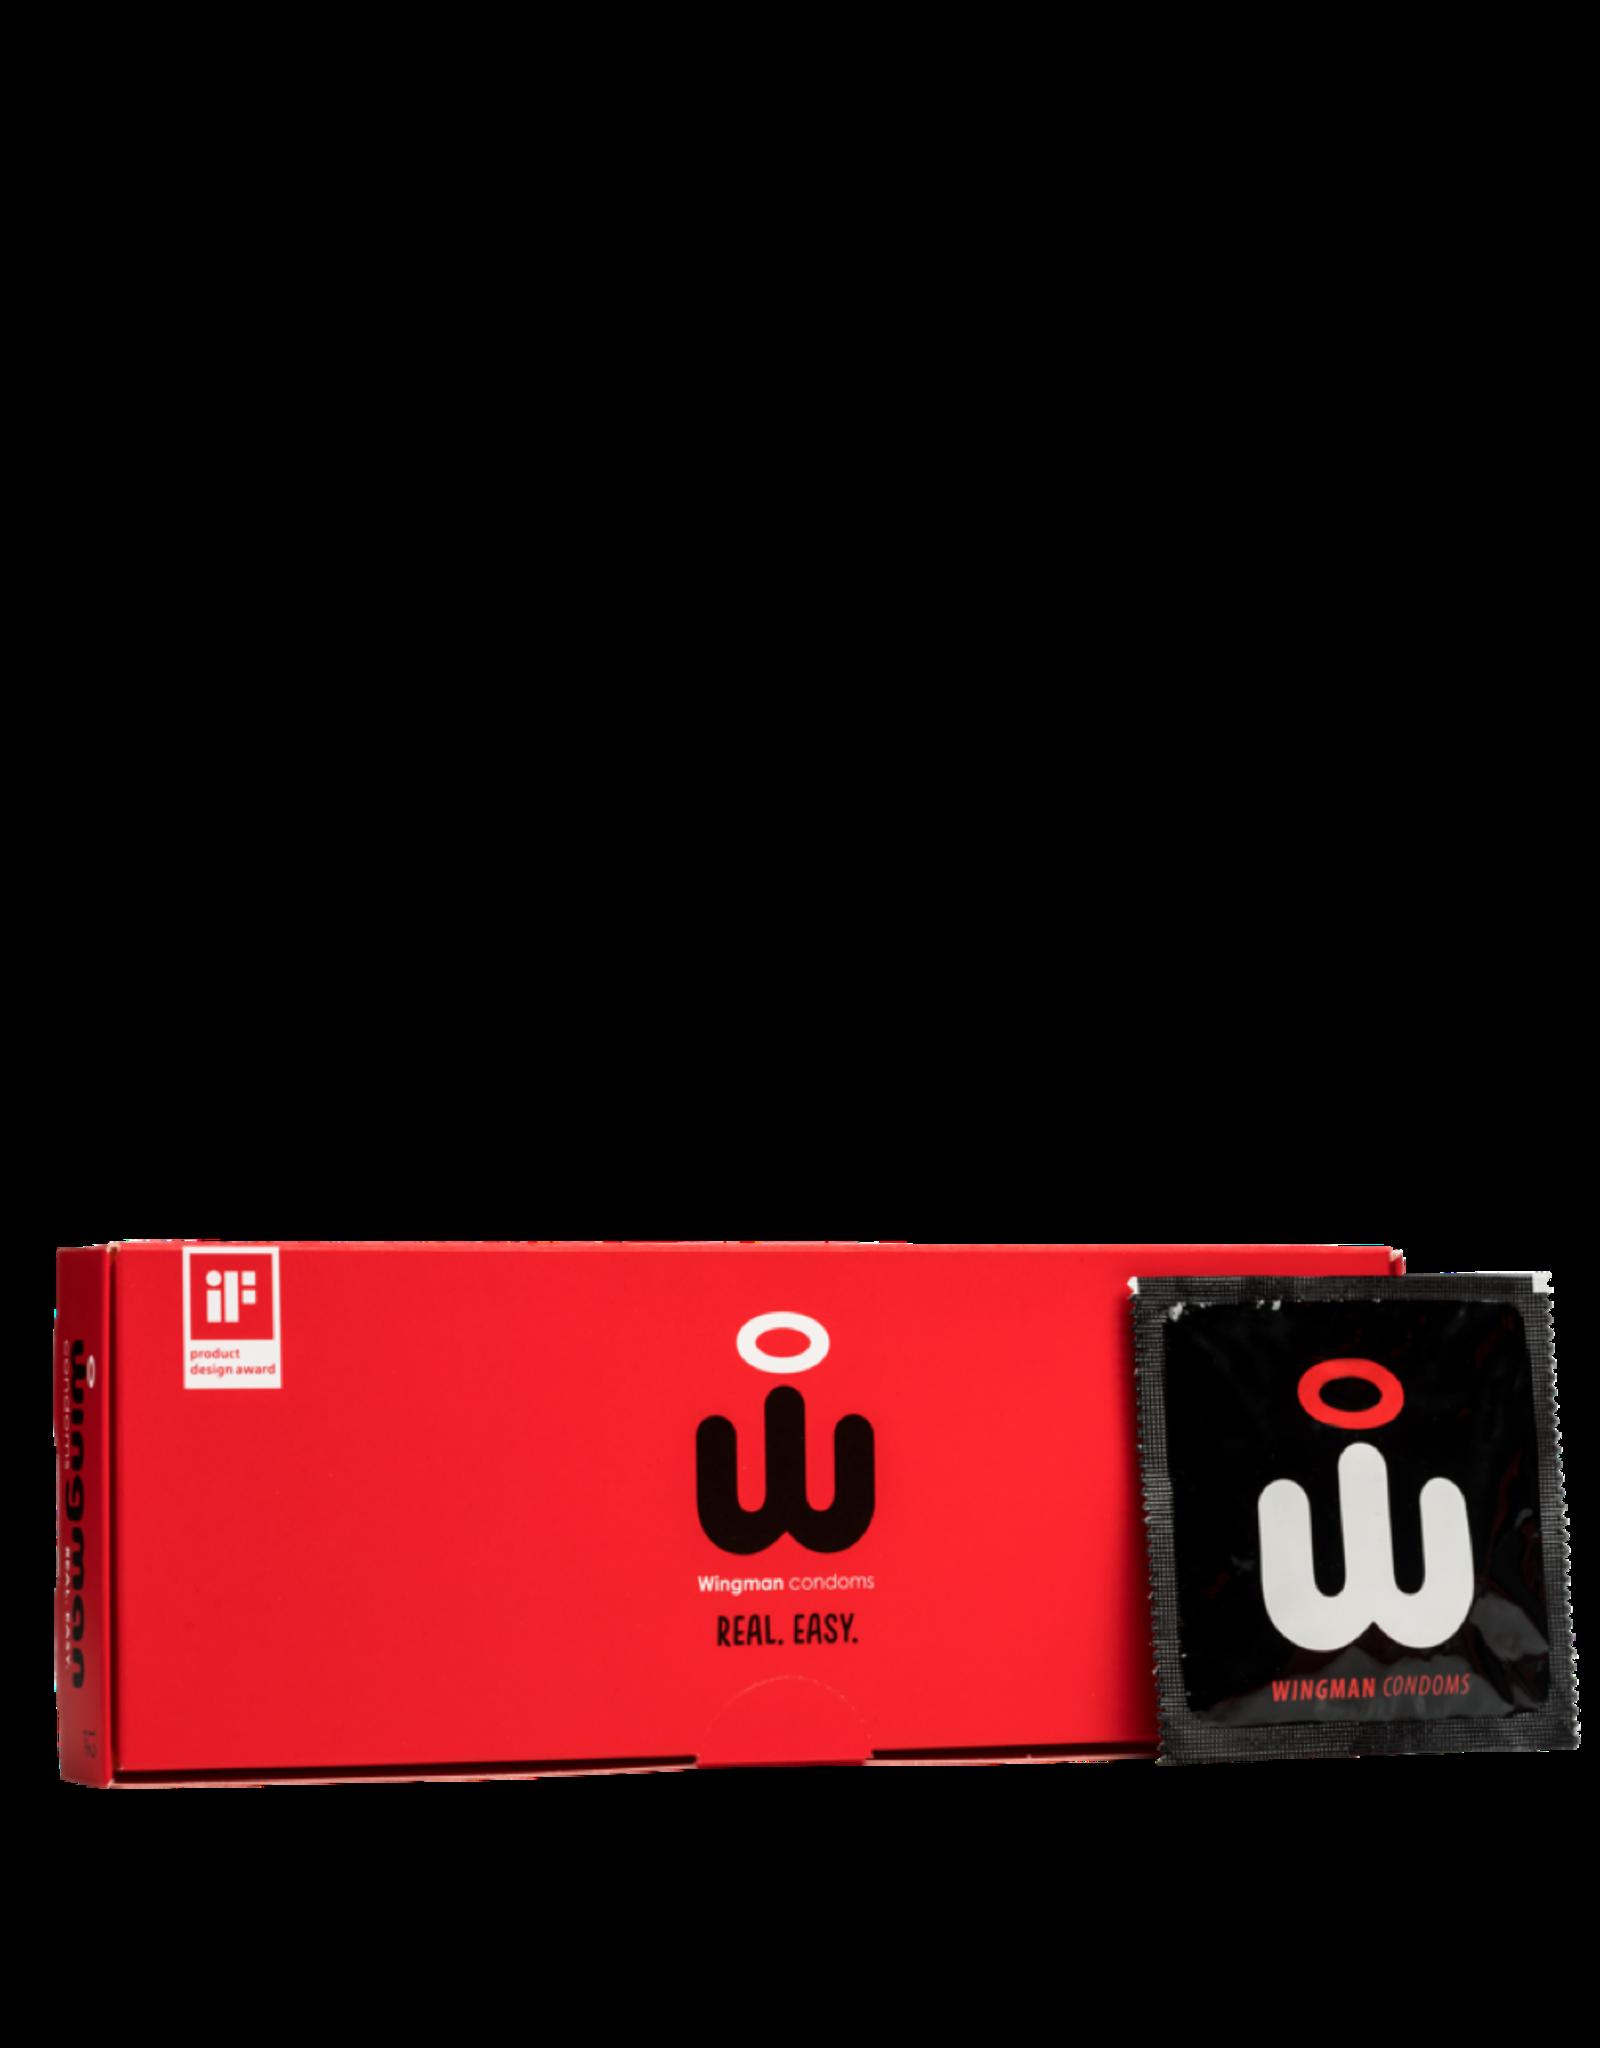 Wingman Wingman Condoms Real Easy - 48x 12 pack 56 mm